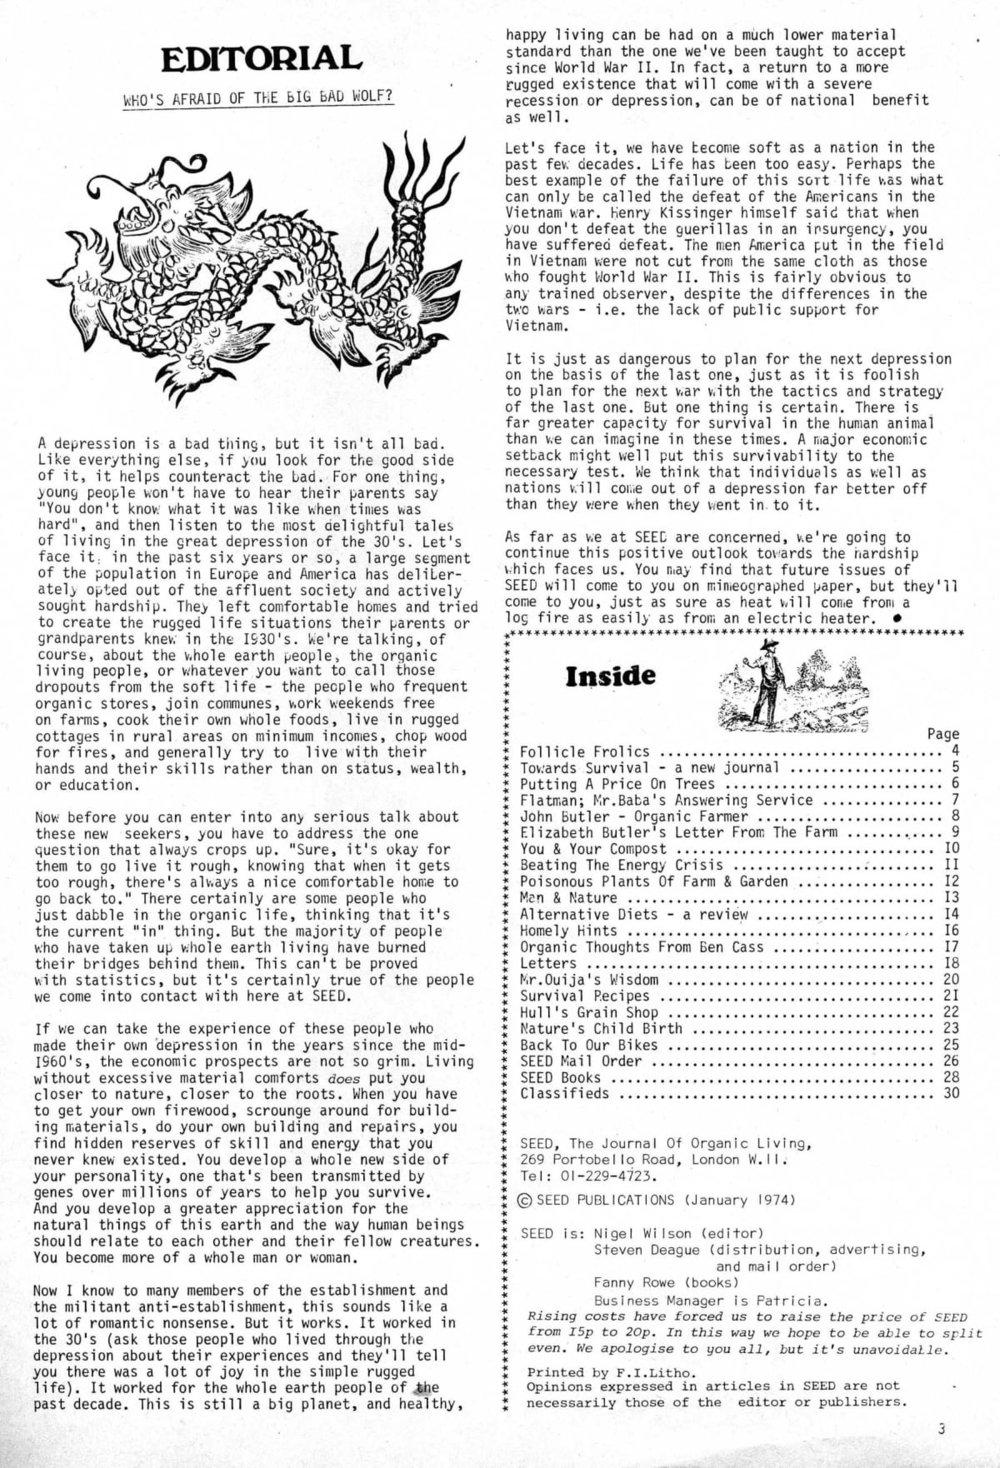 seed-v3-n1-jan1974-03.jpg